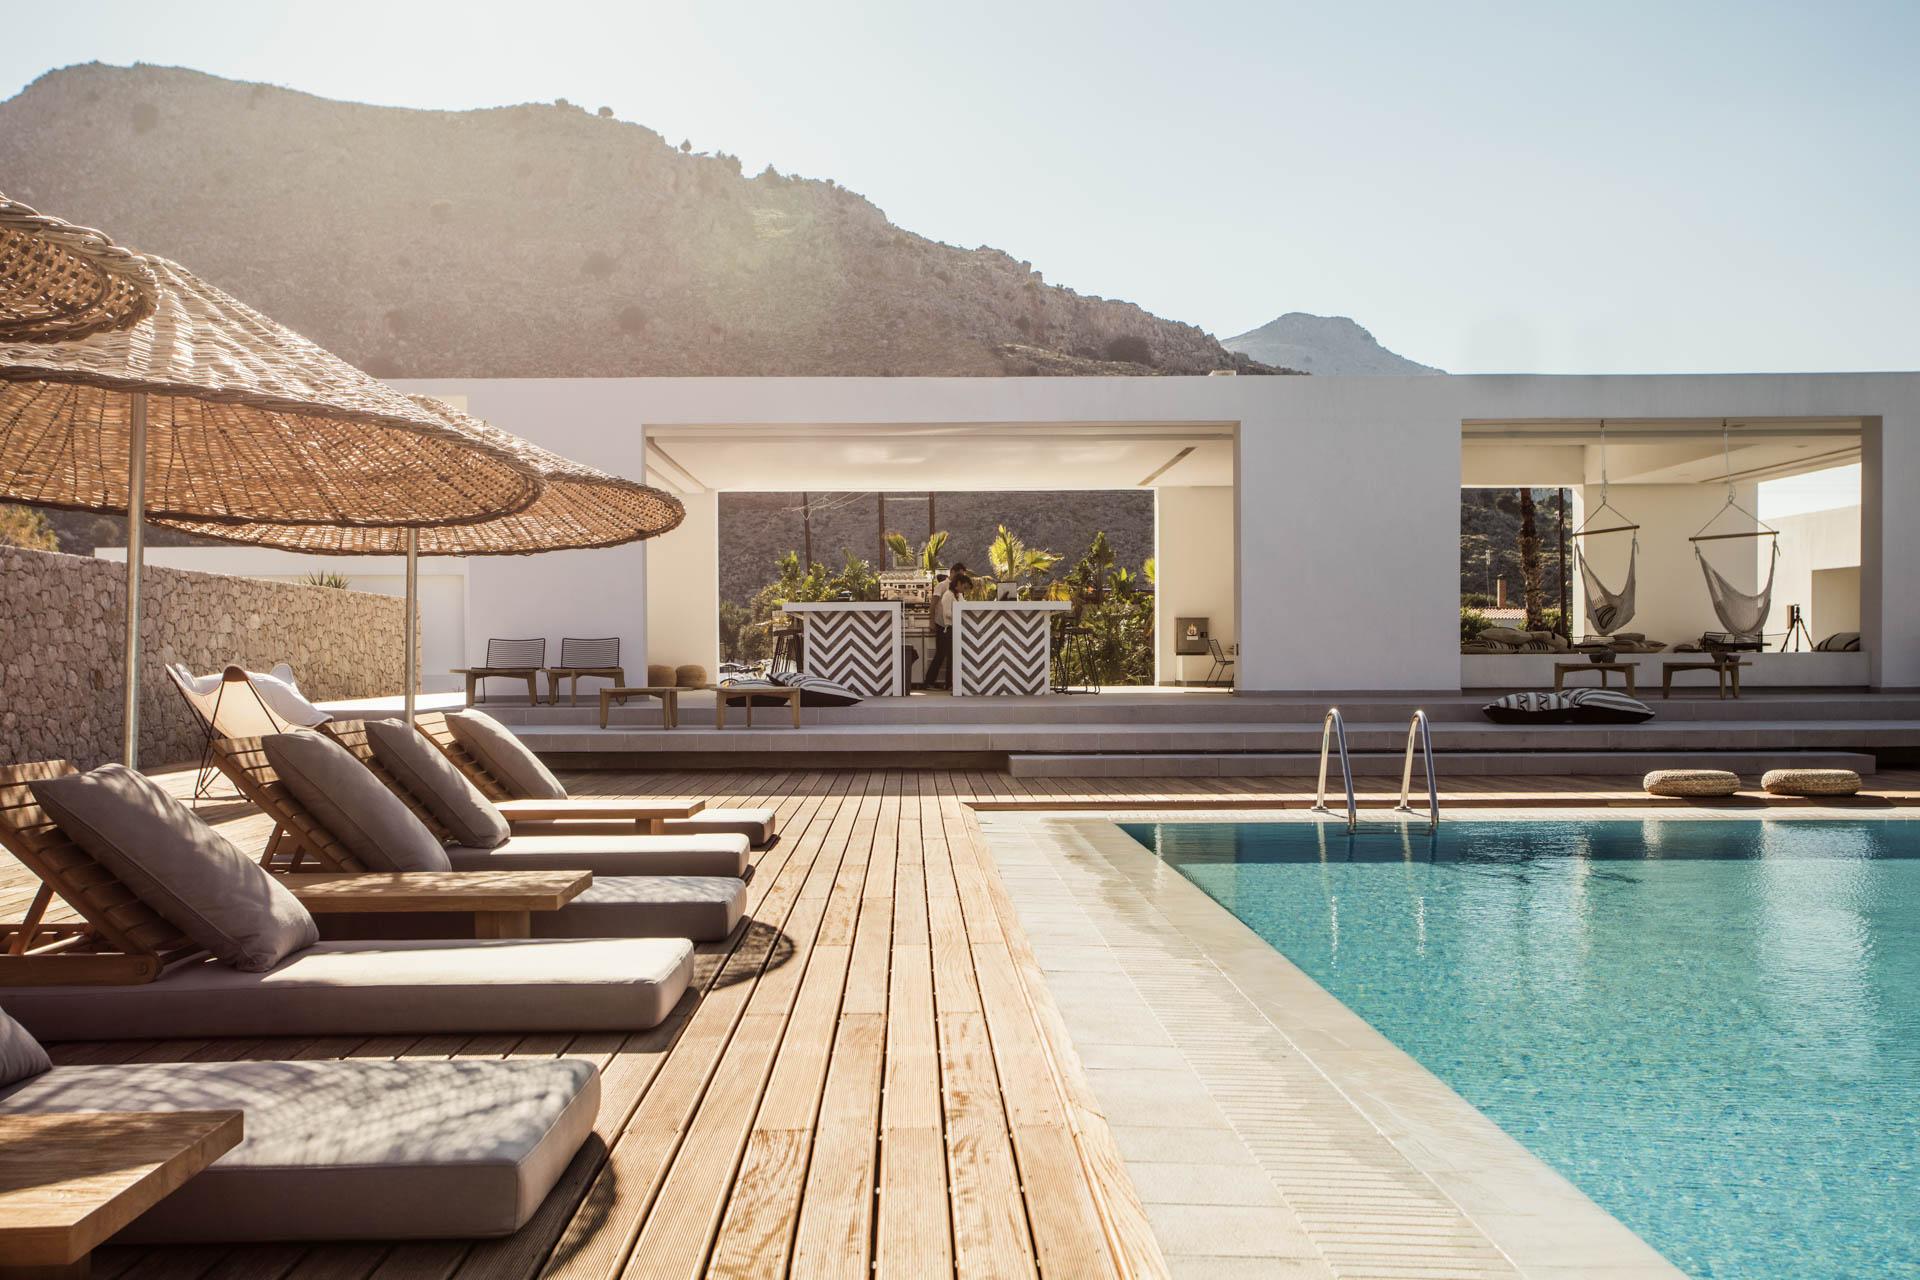 Casa Cook Rhodes | Casa Cook Hotels | Casa Cook Hotels